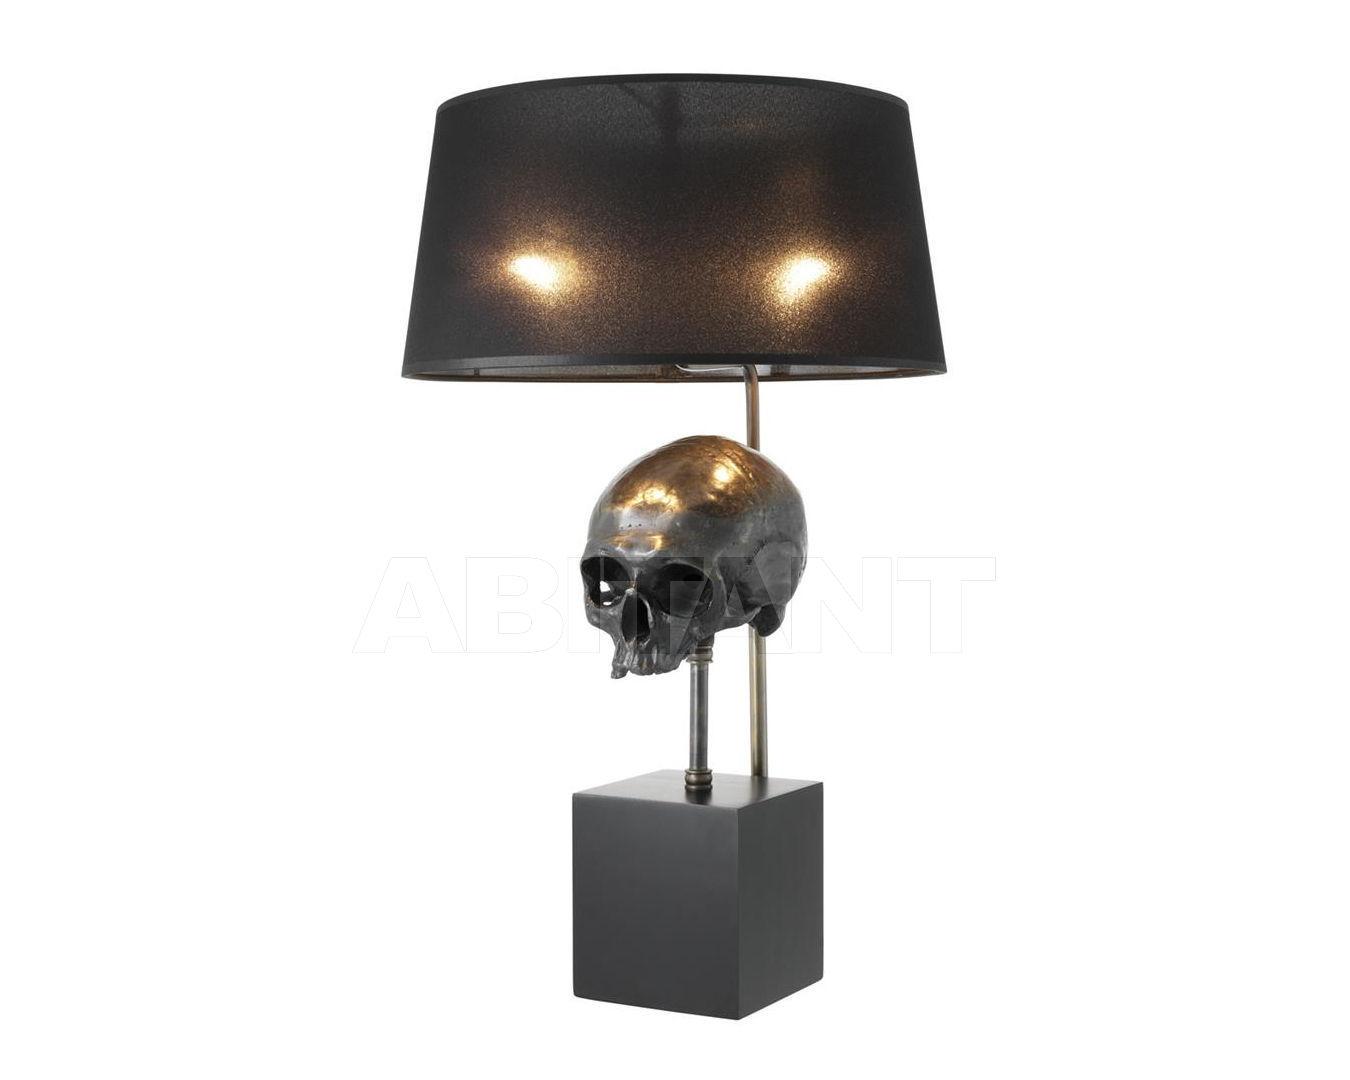 Купить Лампа настольная Extruder Eichholtz  Lighting 105936